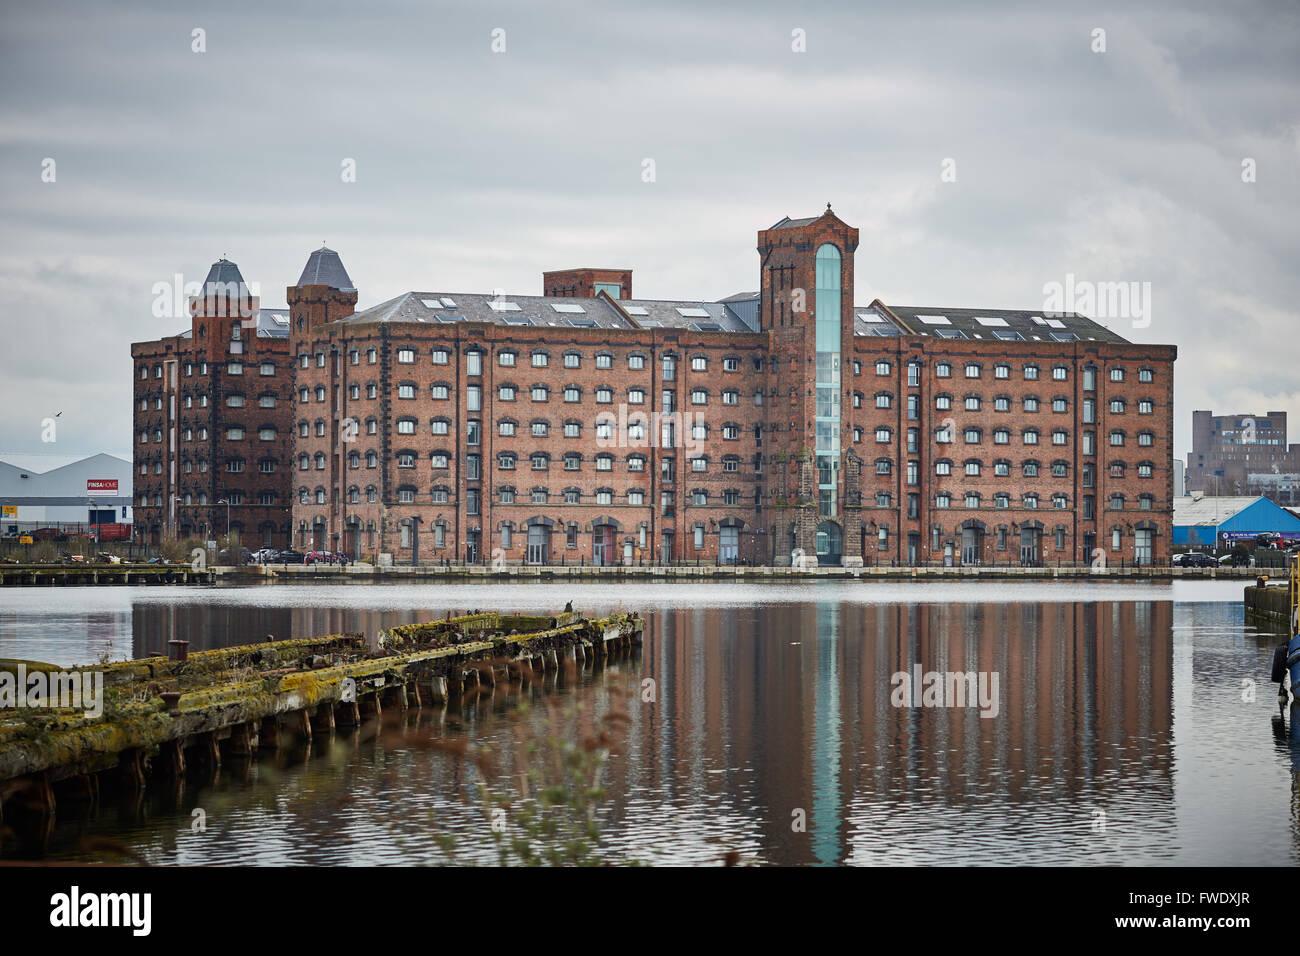 West Float Merseyside Liverpool docks birkenhead   from Duke Street bridge warehouse basin large brick built Corn - Stock Image